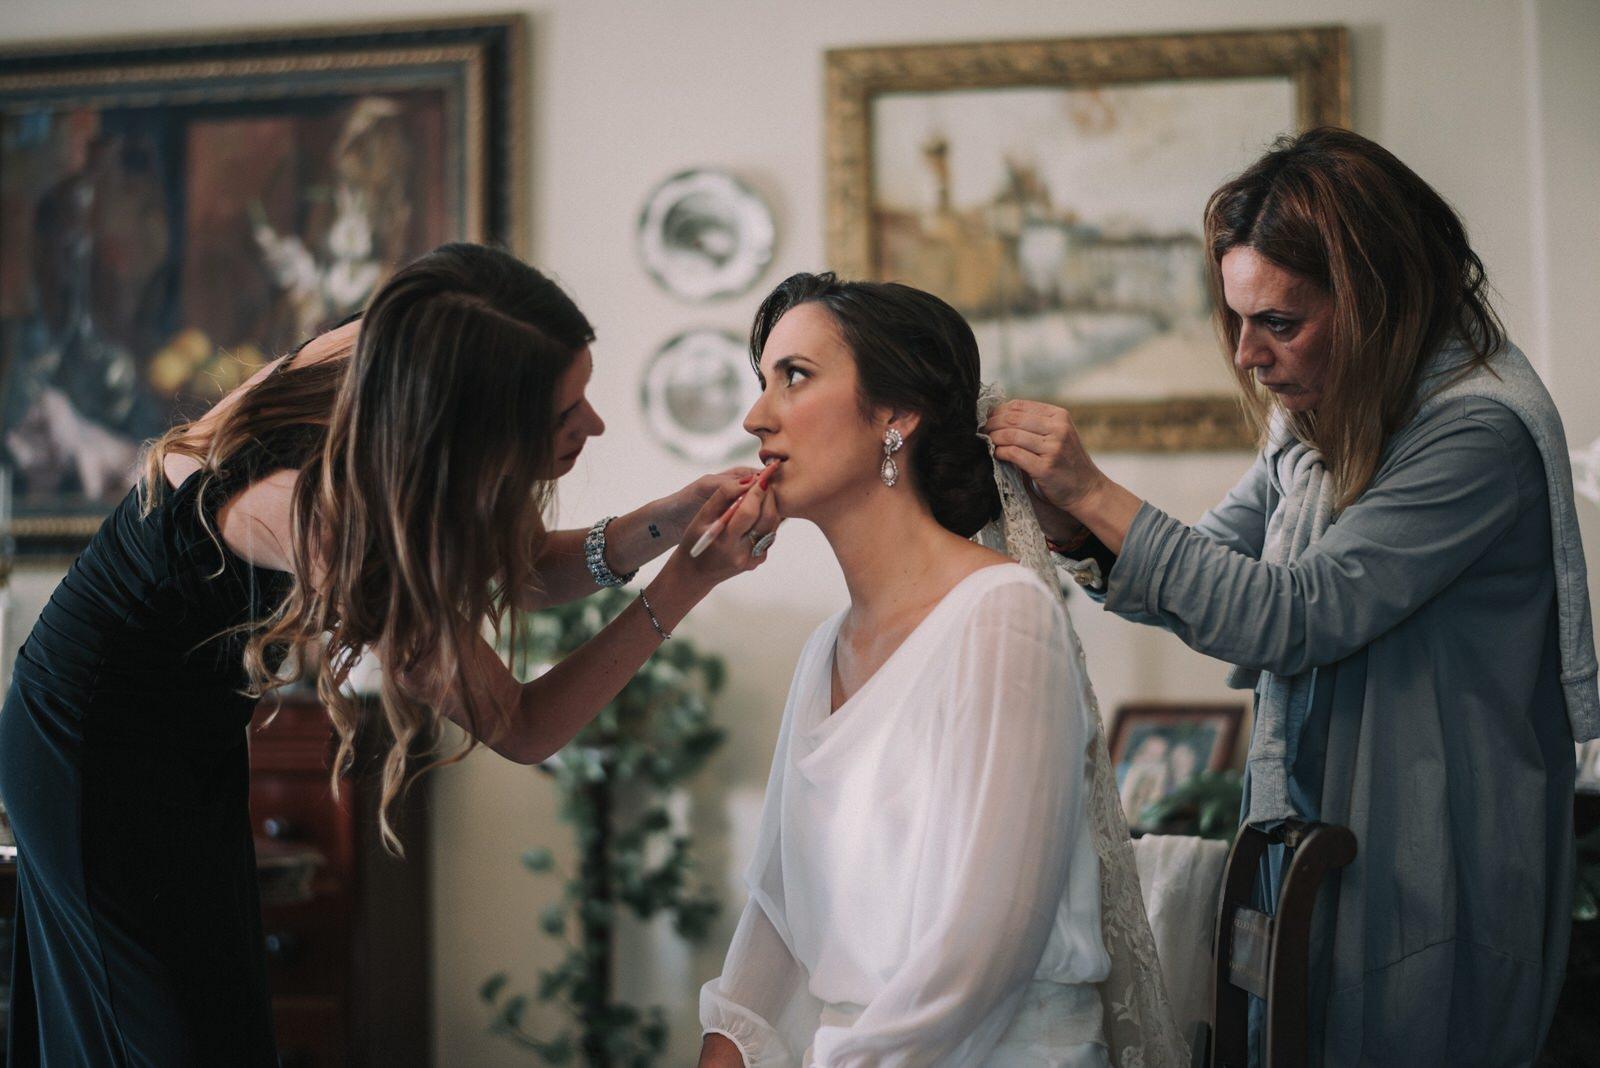 fotografo de bodas sevilla - fotografo boda - fotografía sevilla - Andrés AmarilloAAA_4470- tele- fine.JPG